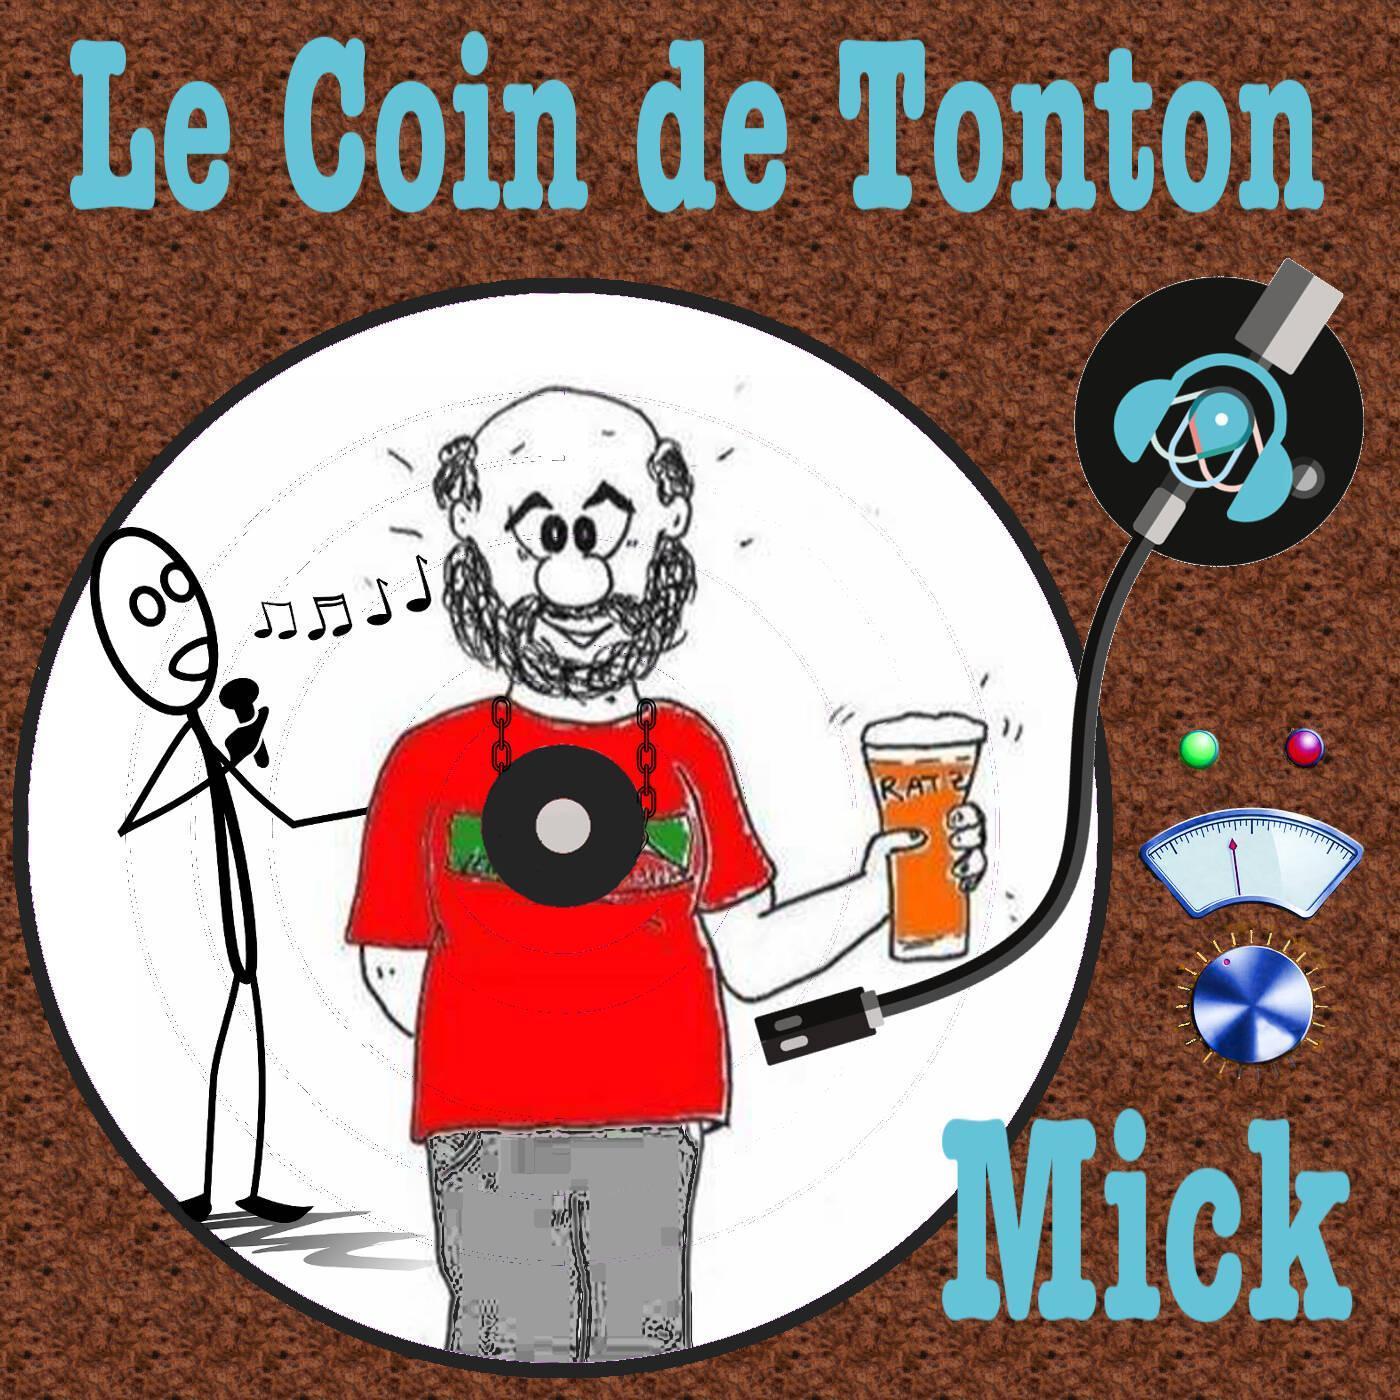 LE COIN DE TONTON MICK S1E23 - Victoria Delarozière